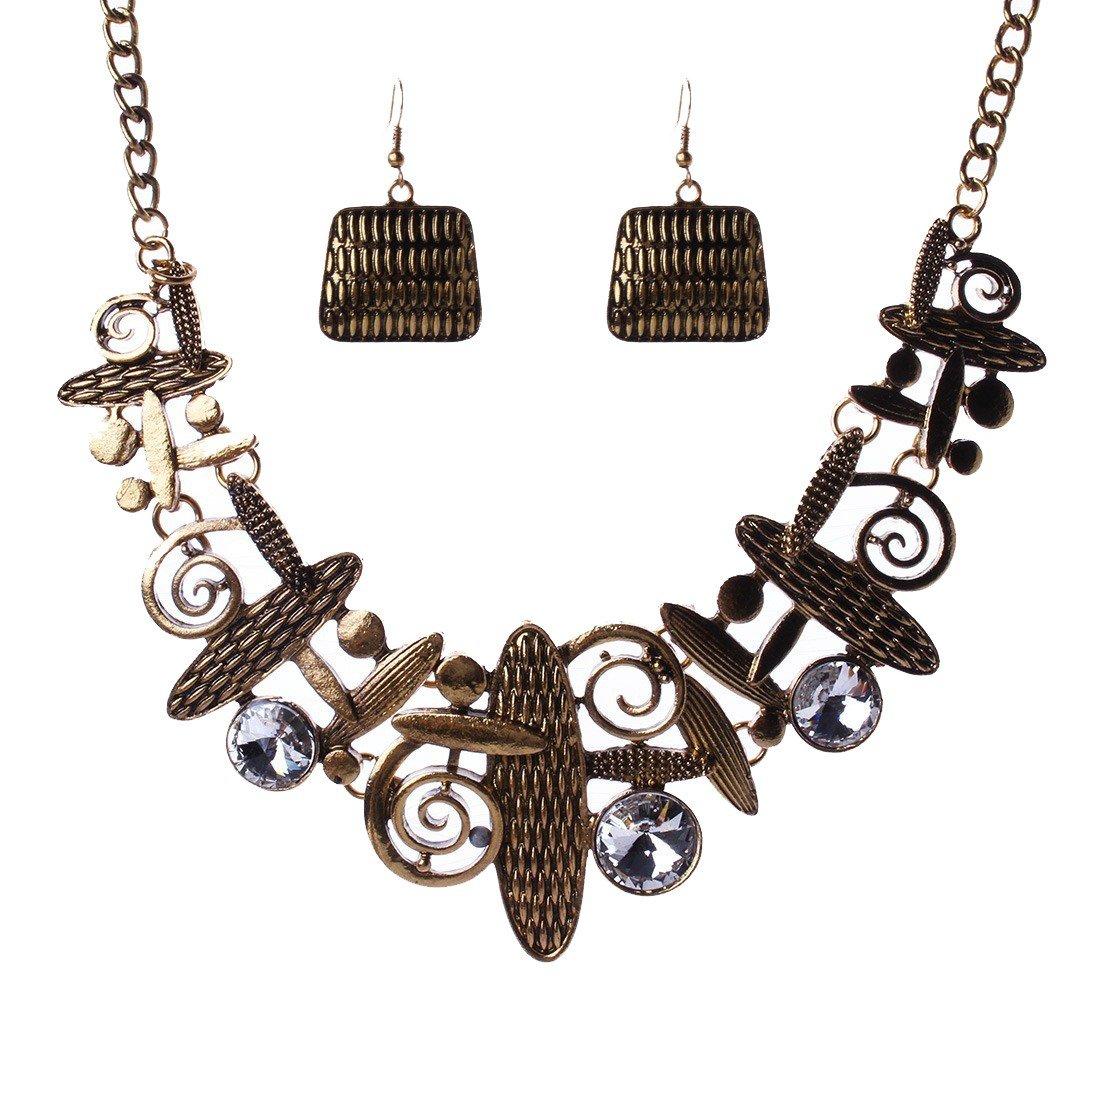 Qiyun Unique Art Tribal Abstract Pattern Bib Choker Necklace Earrings Set Art Abstrait Mode le Collier W005N1873